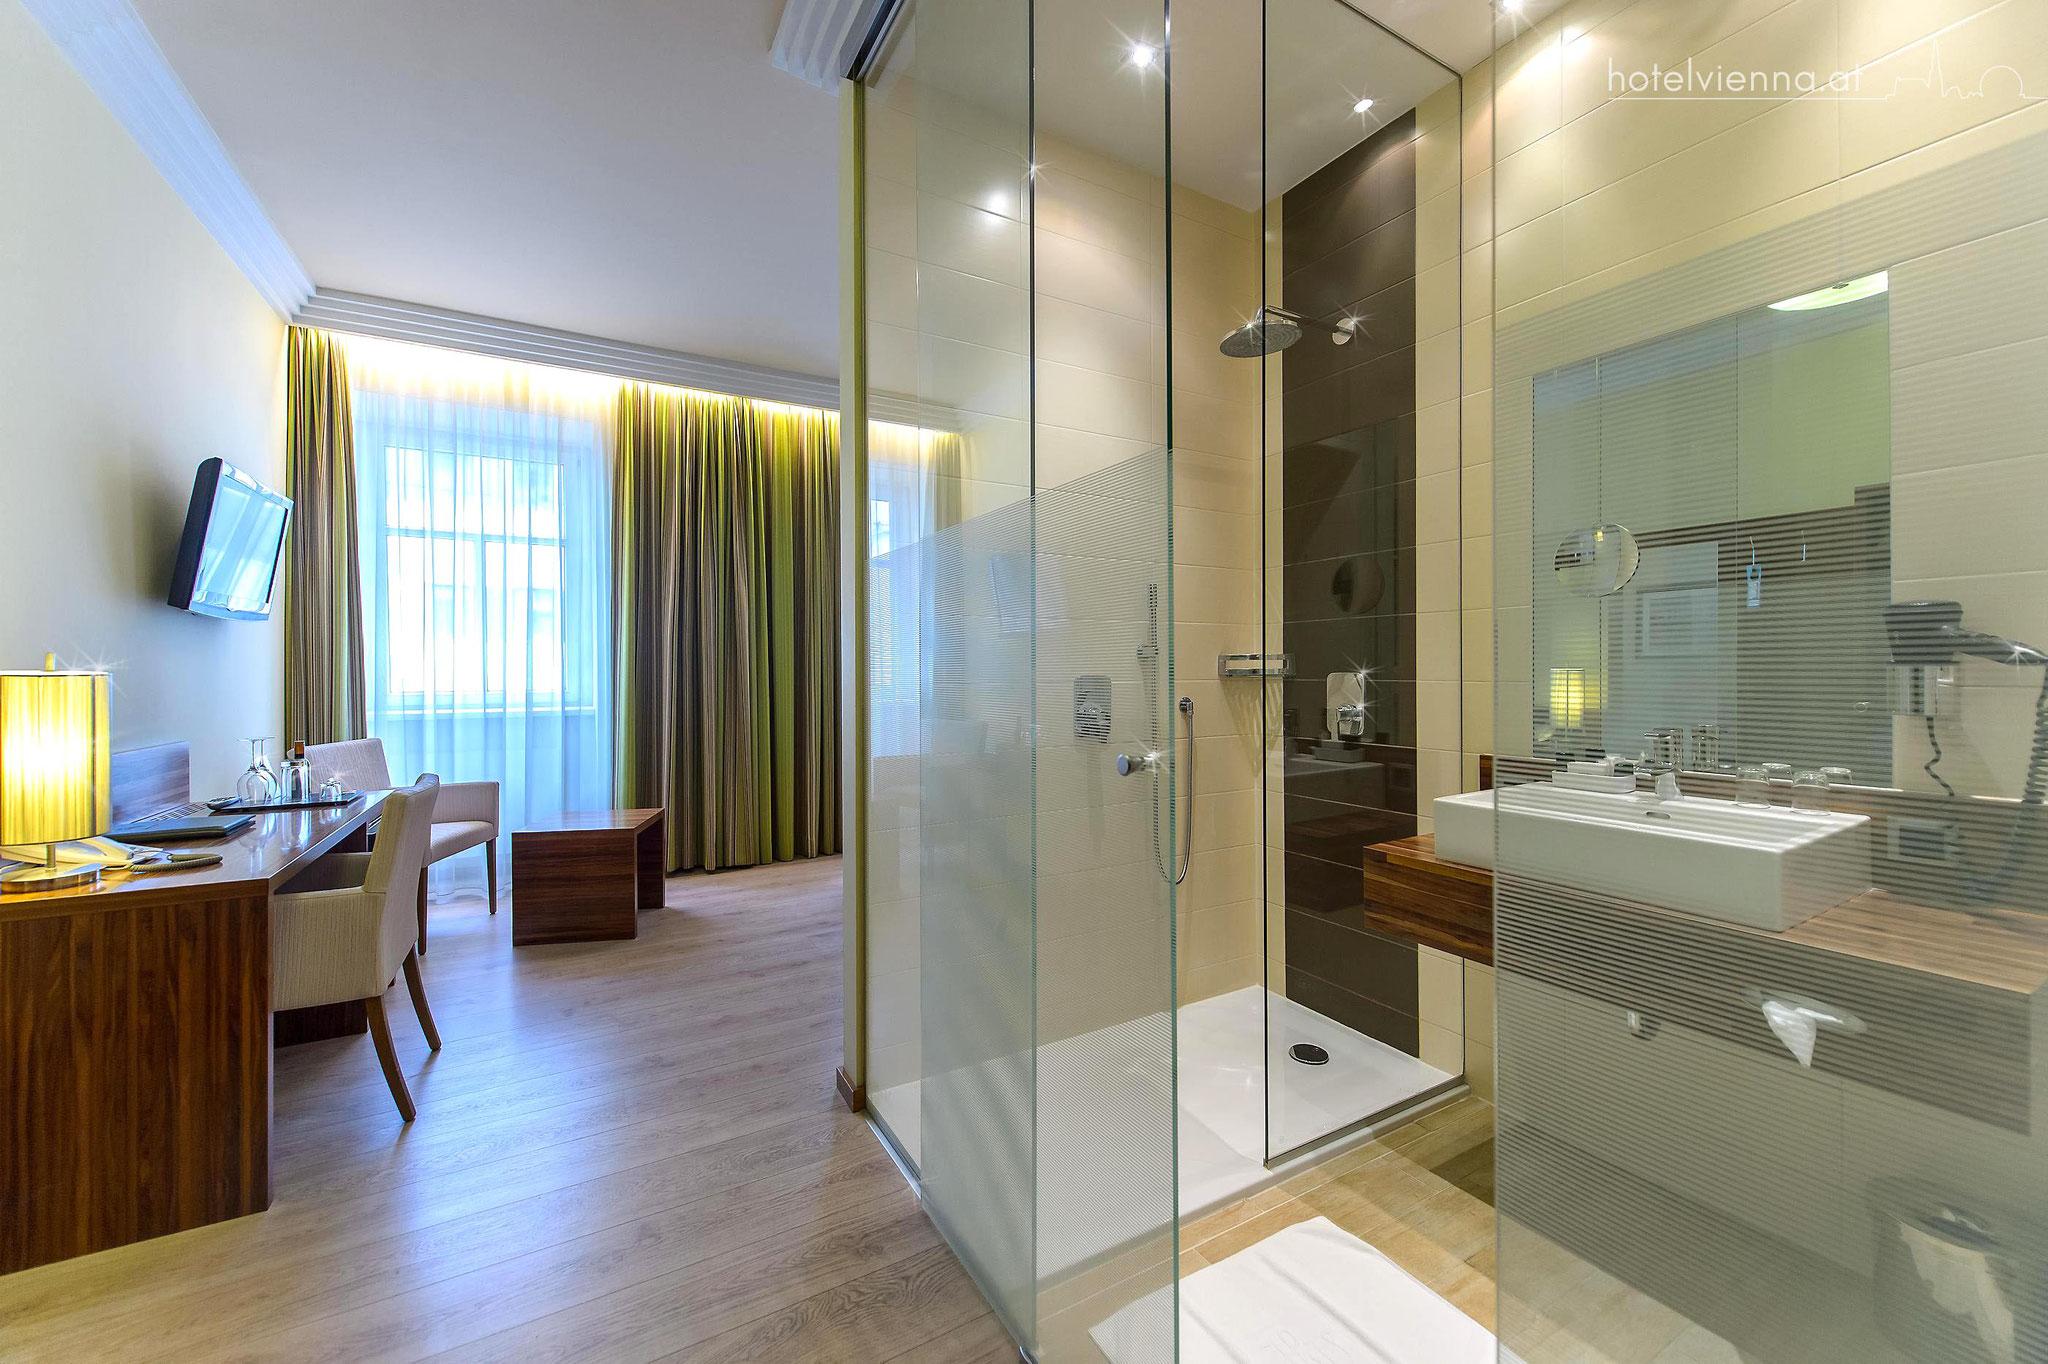 Hotel Vienna design double room